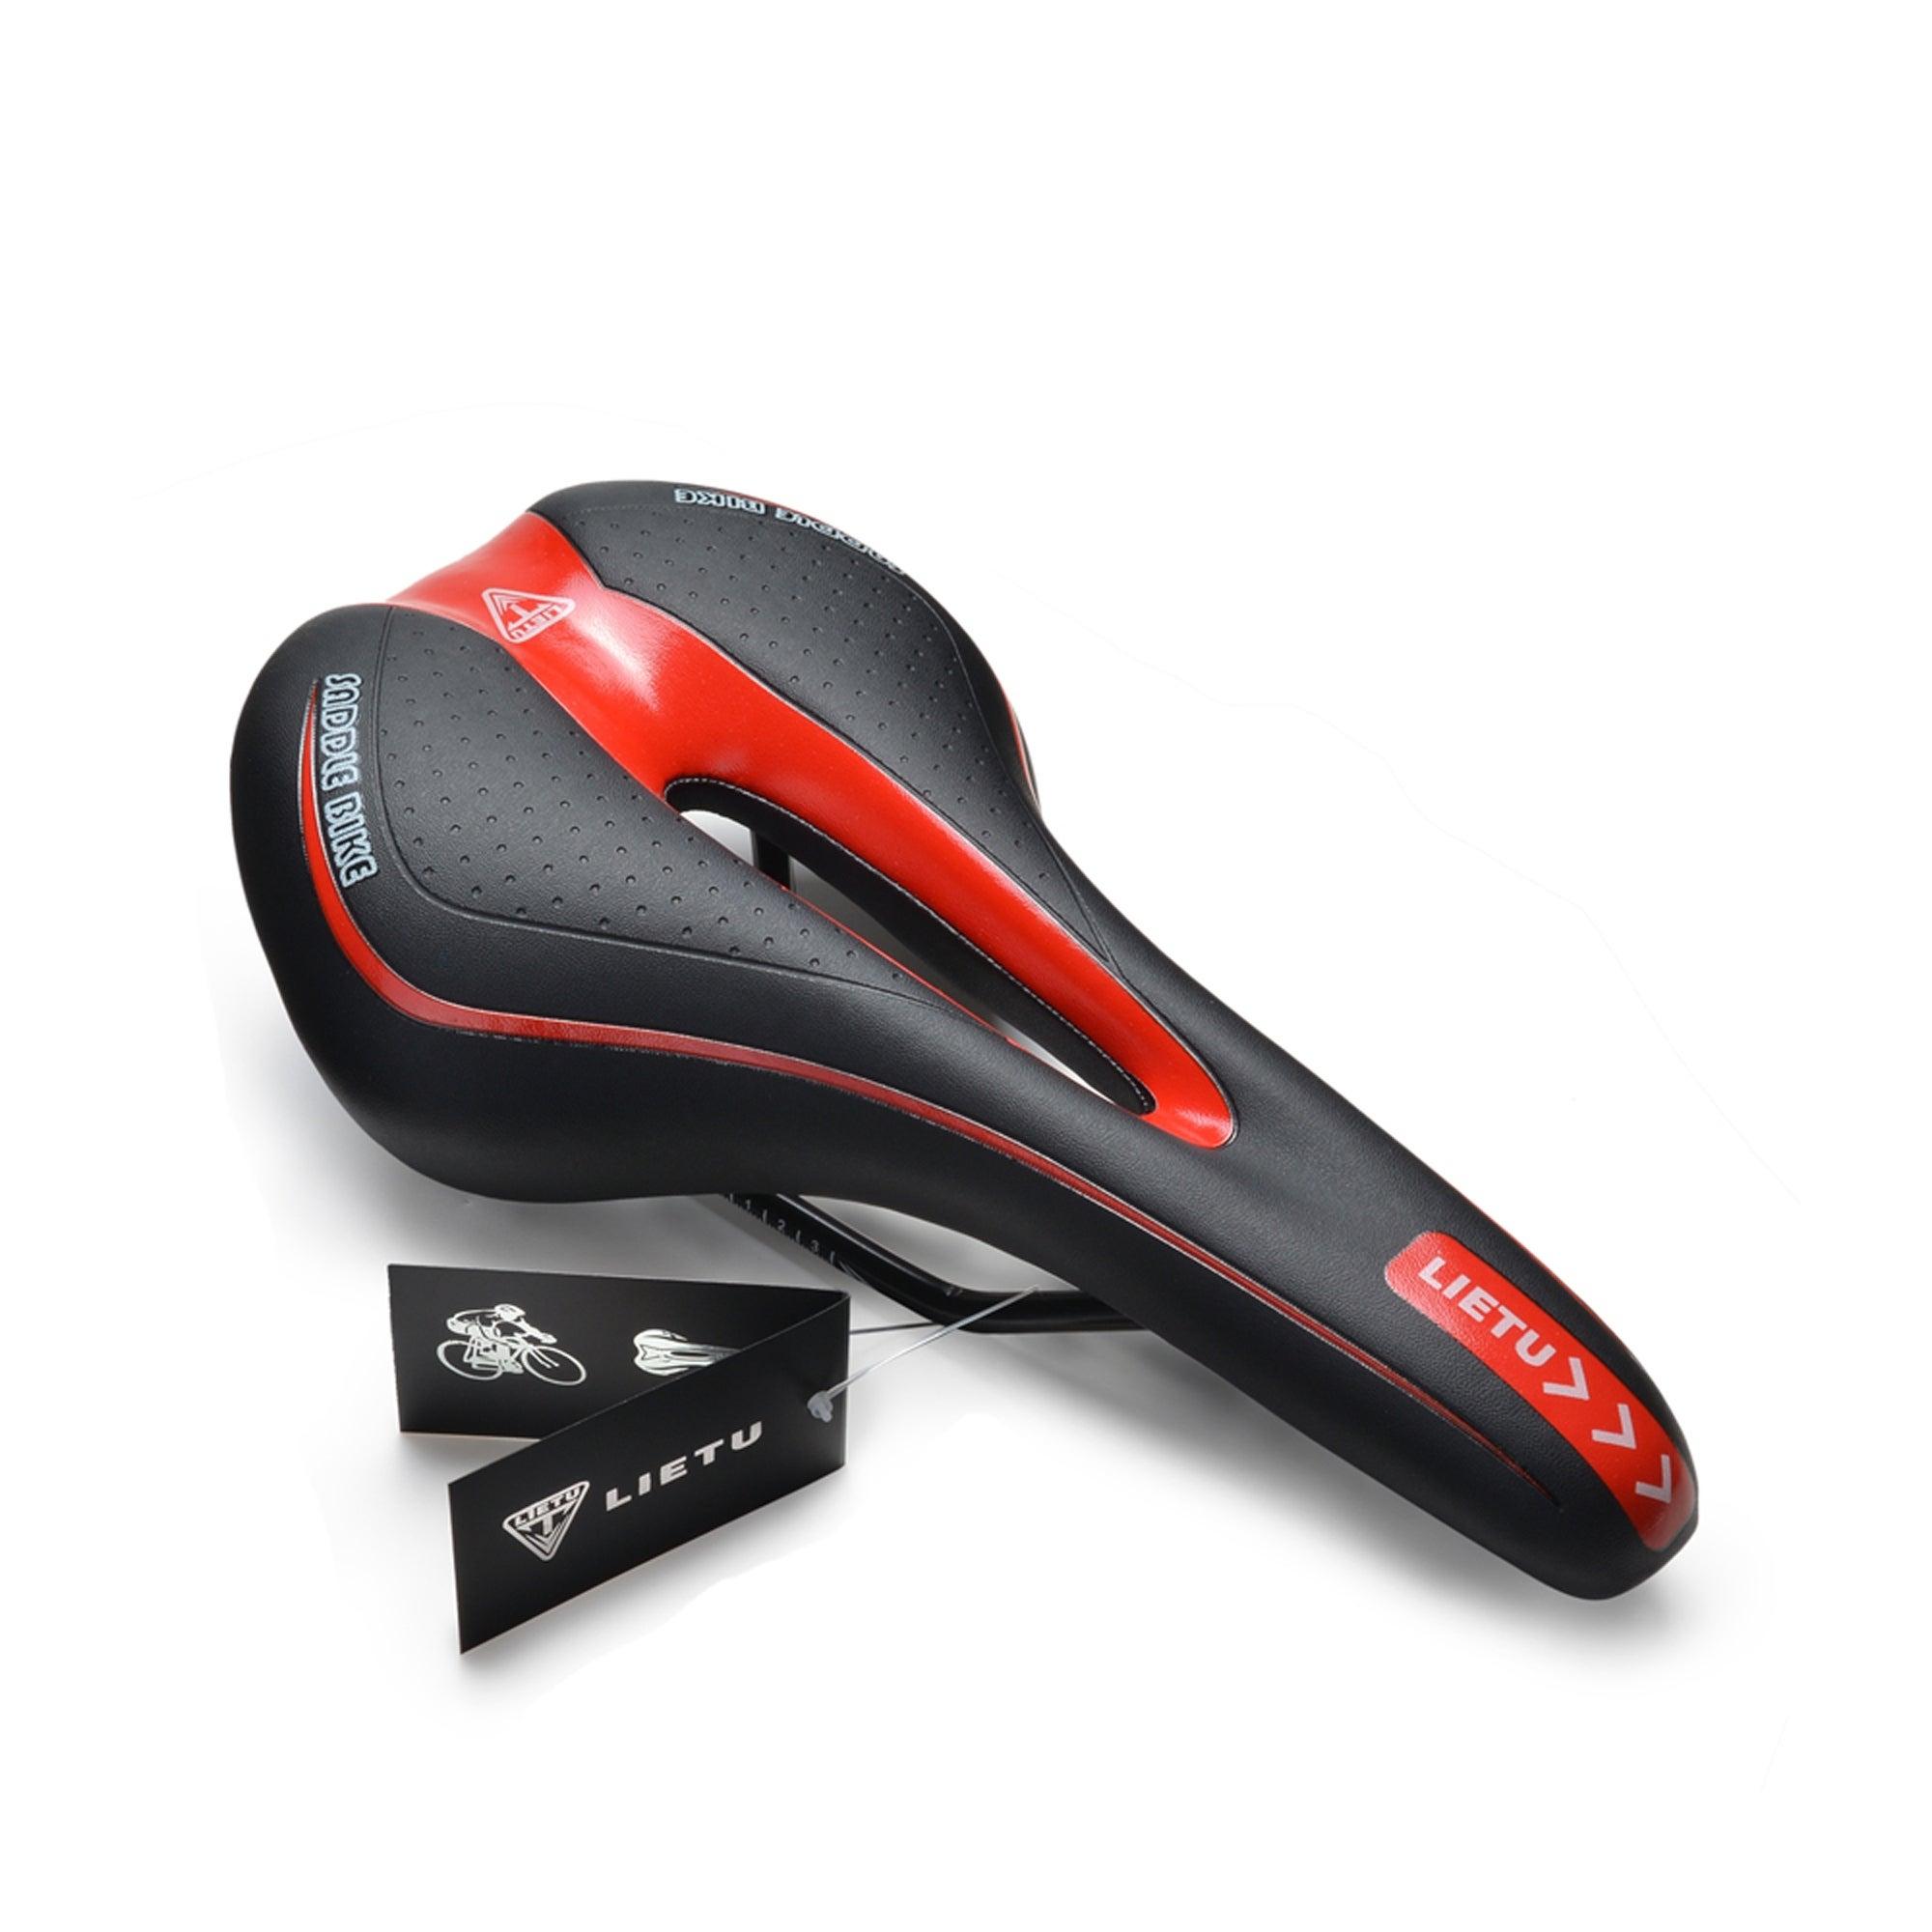 Red Comfort Soft Cushion Pad Saddle Bike Road Mountain MTB Bicycle Cycling Seat